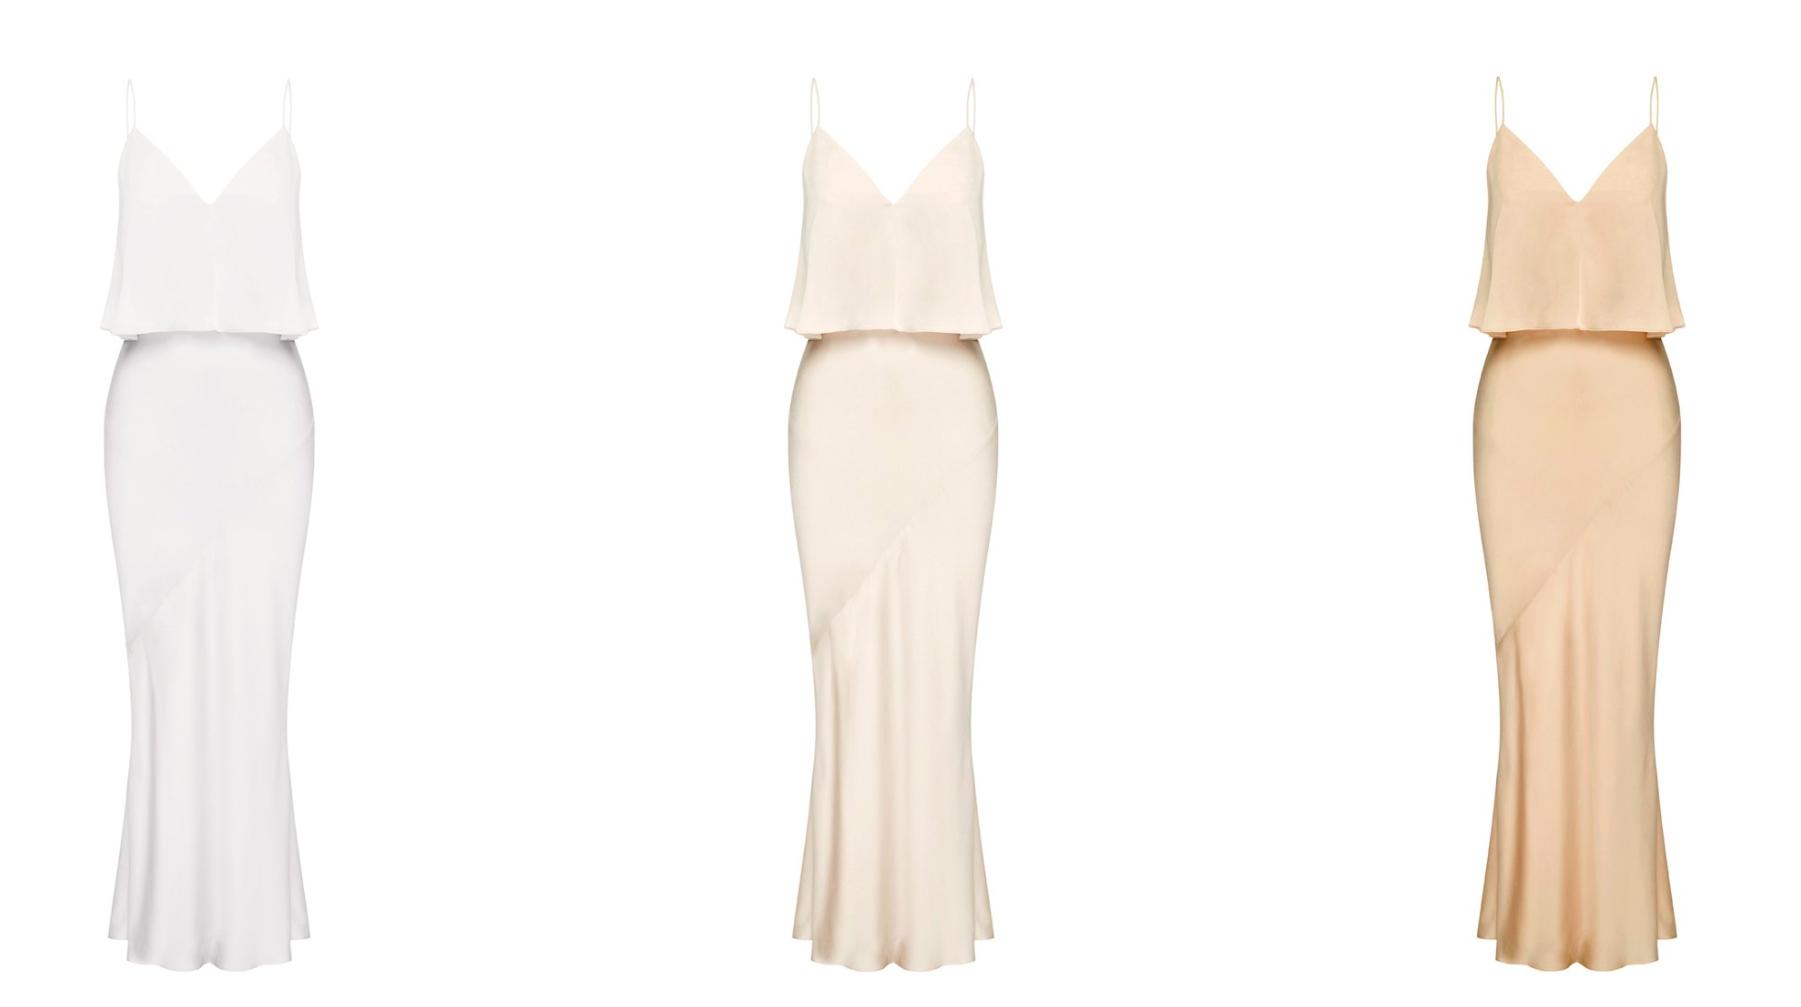 LUXE BIAS FRILL SLIP DRESS - SHONA JOY featured on LOVE FIND CO.